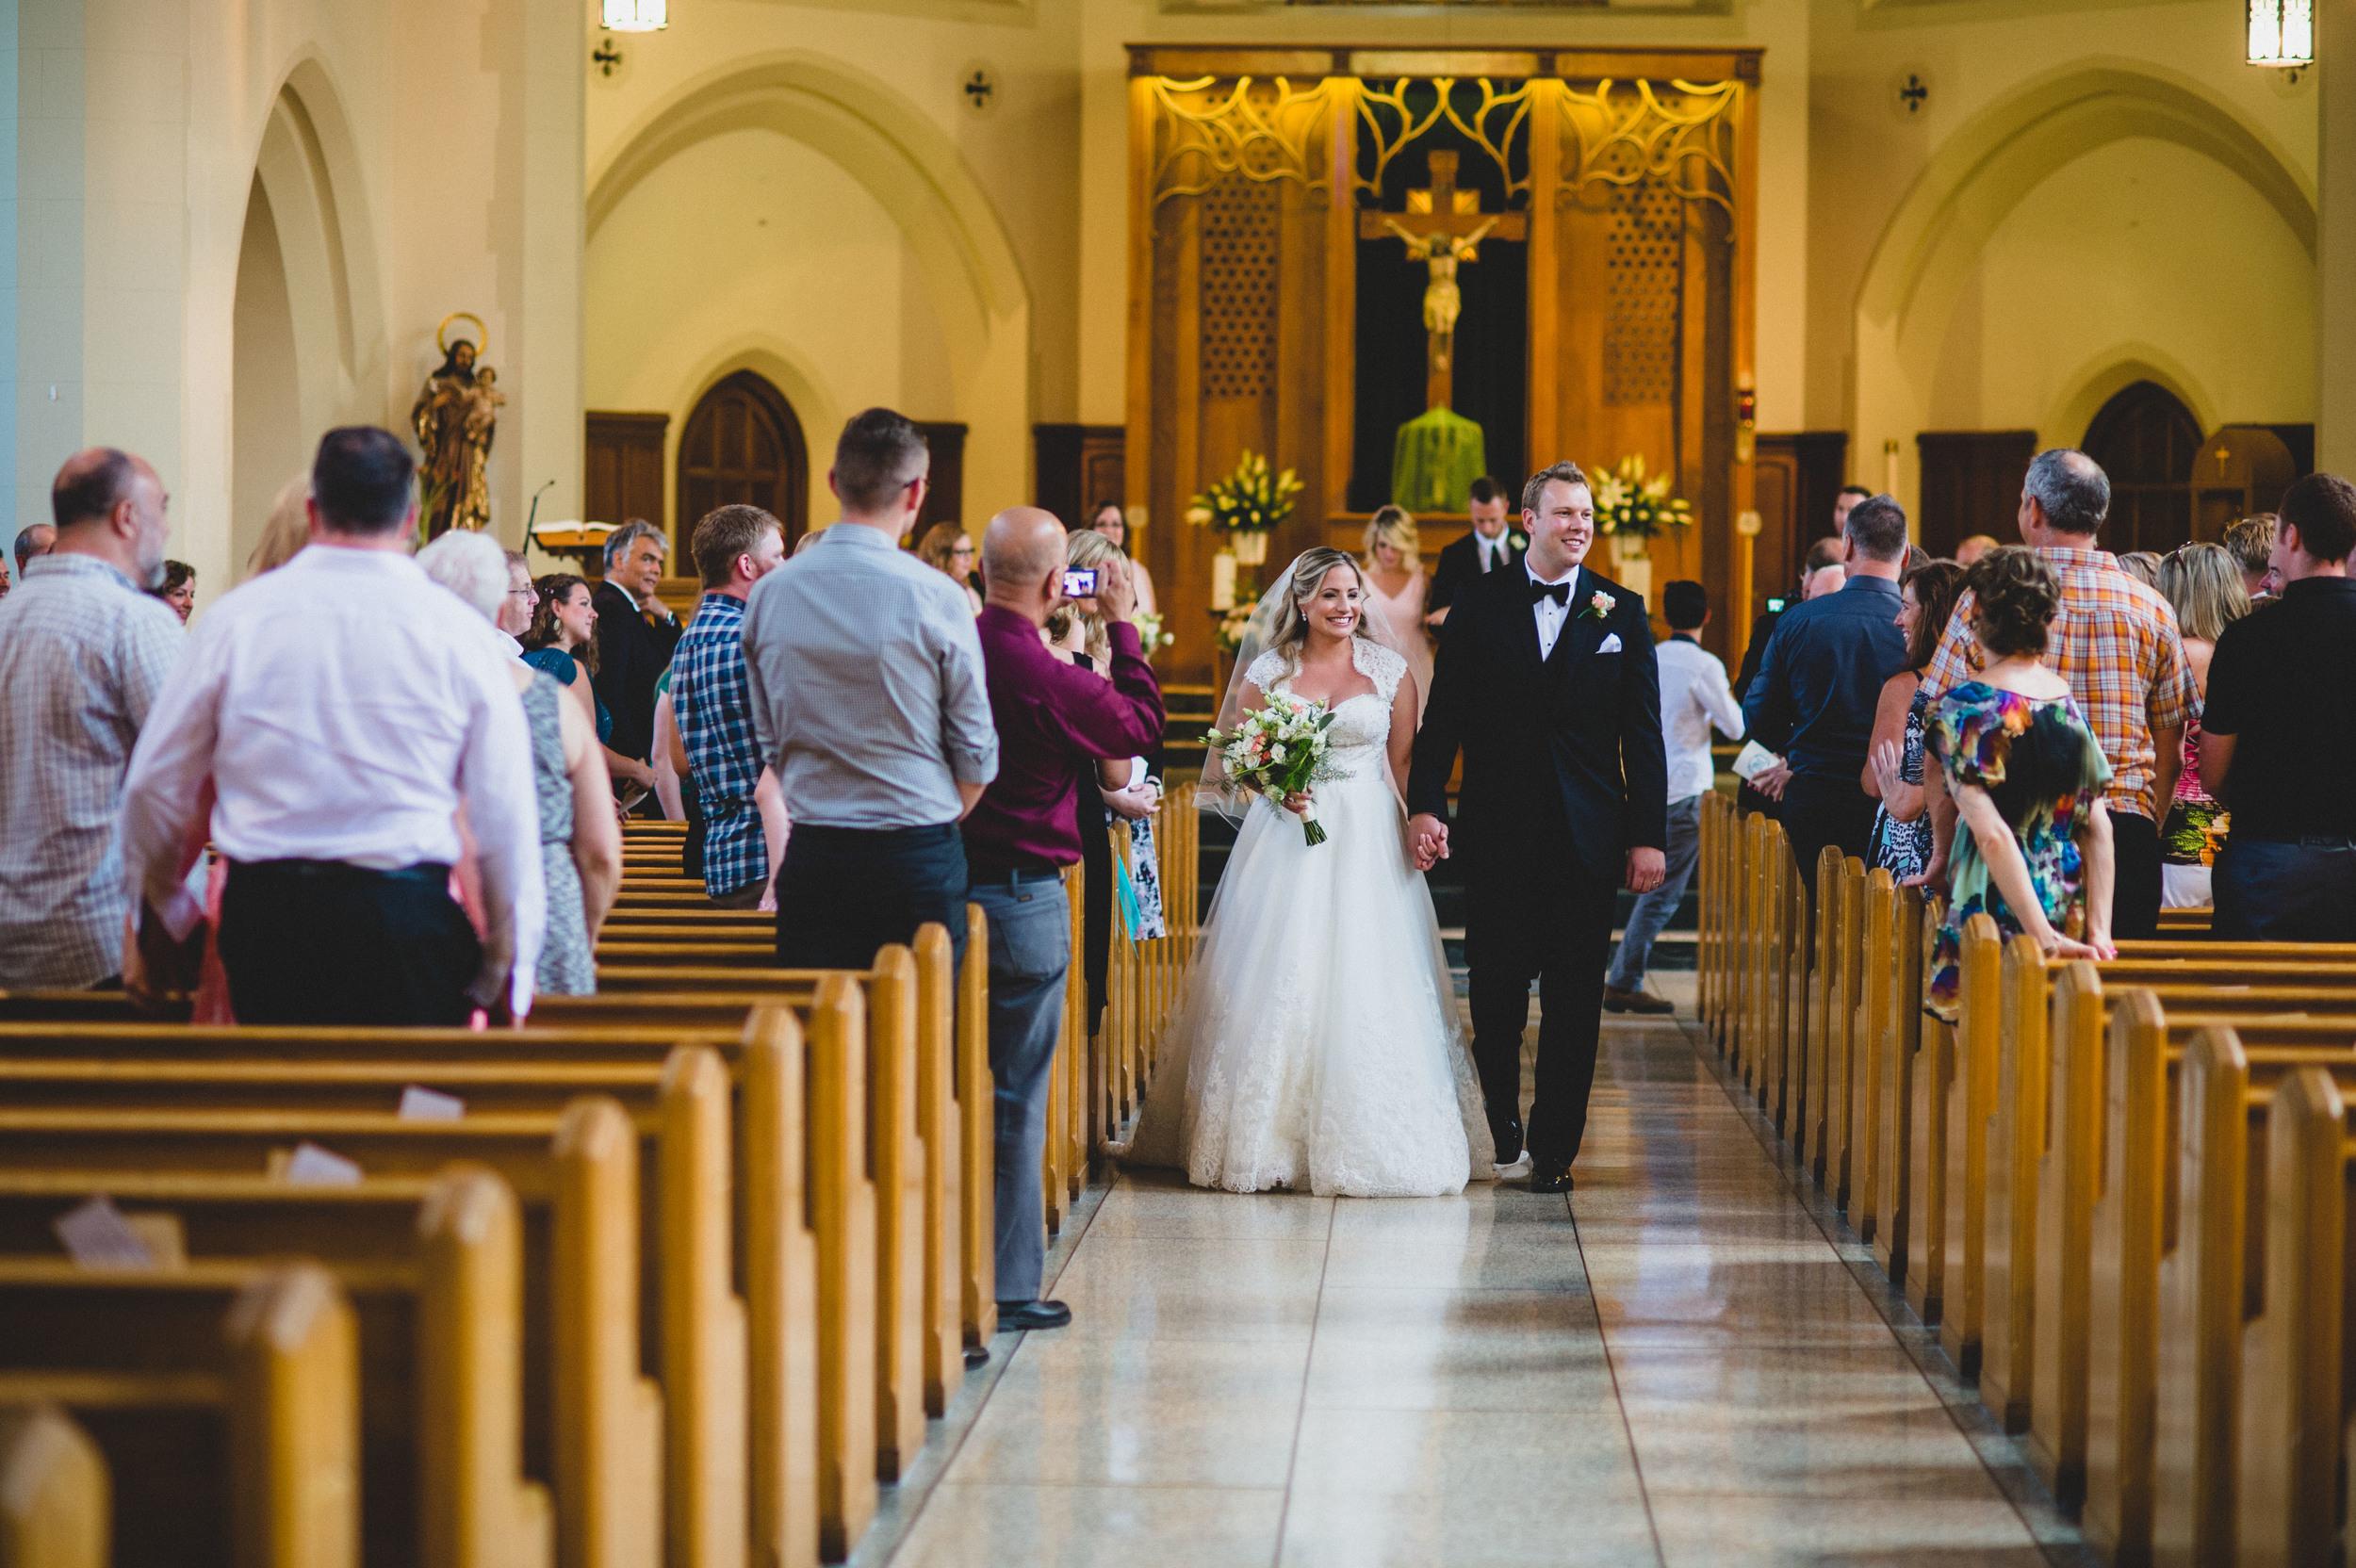 Vancouver St Augustine 's Church wedding photographer edward lai photography-53.jpg